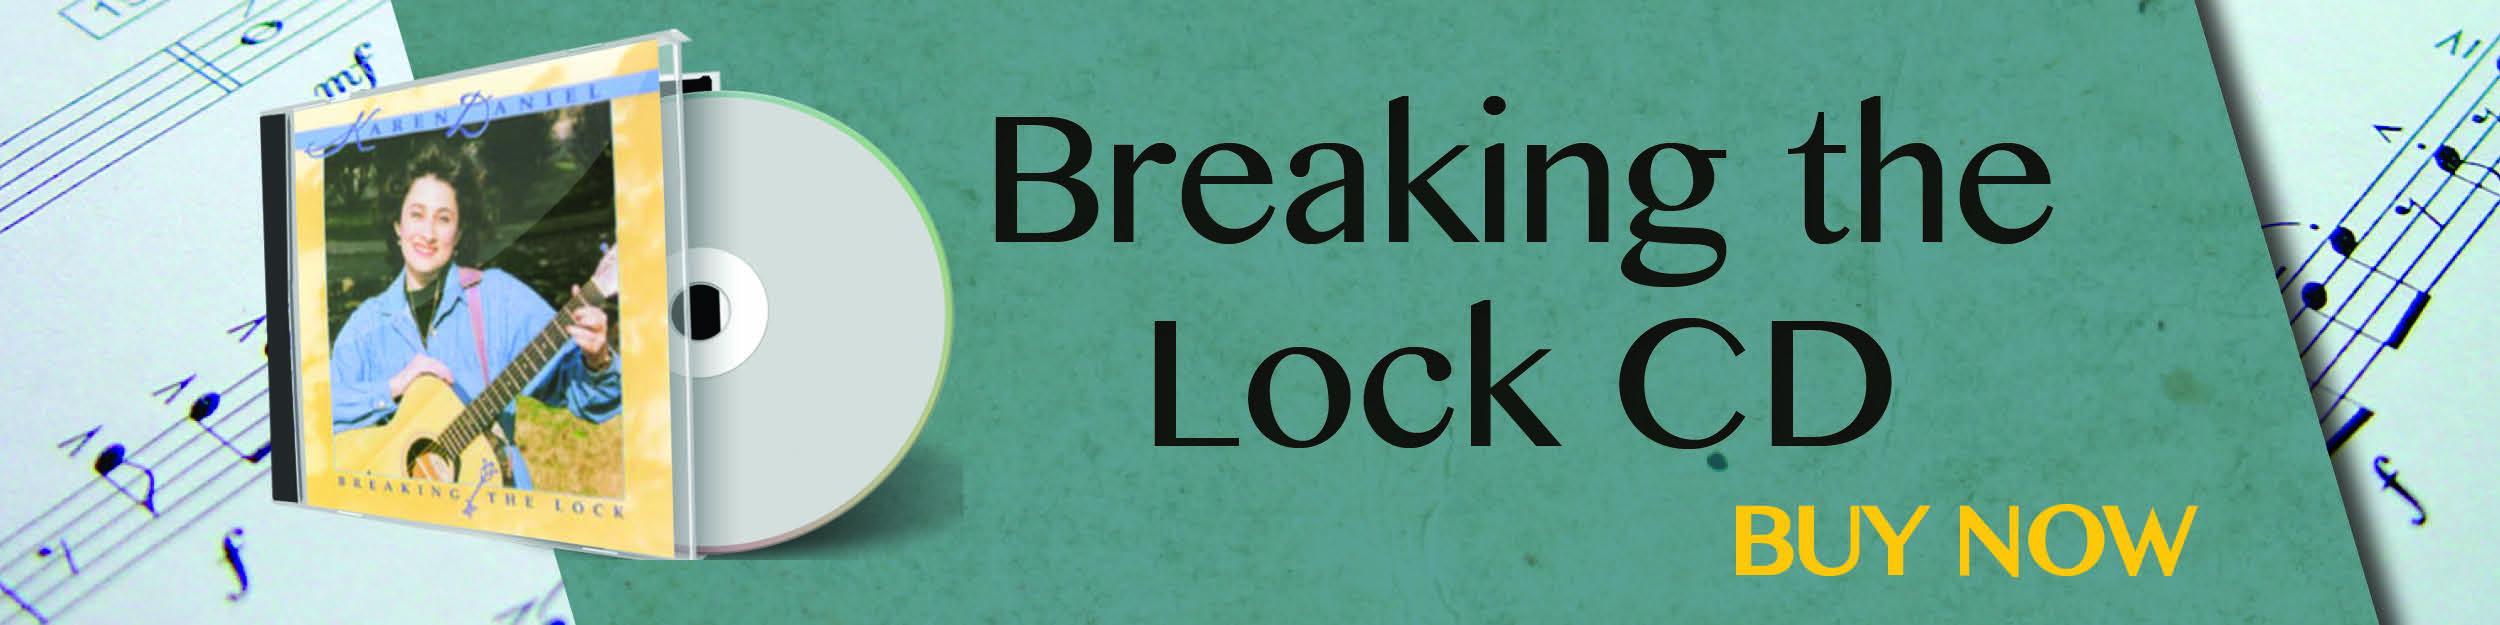 Store-breaking-the-lock-600WIDE (1)